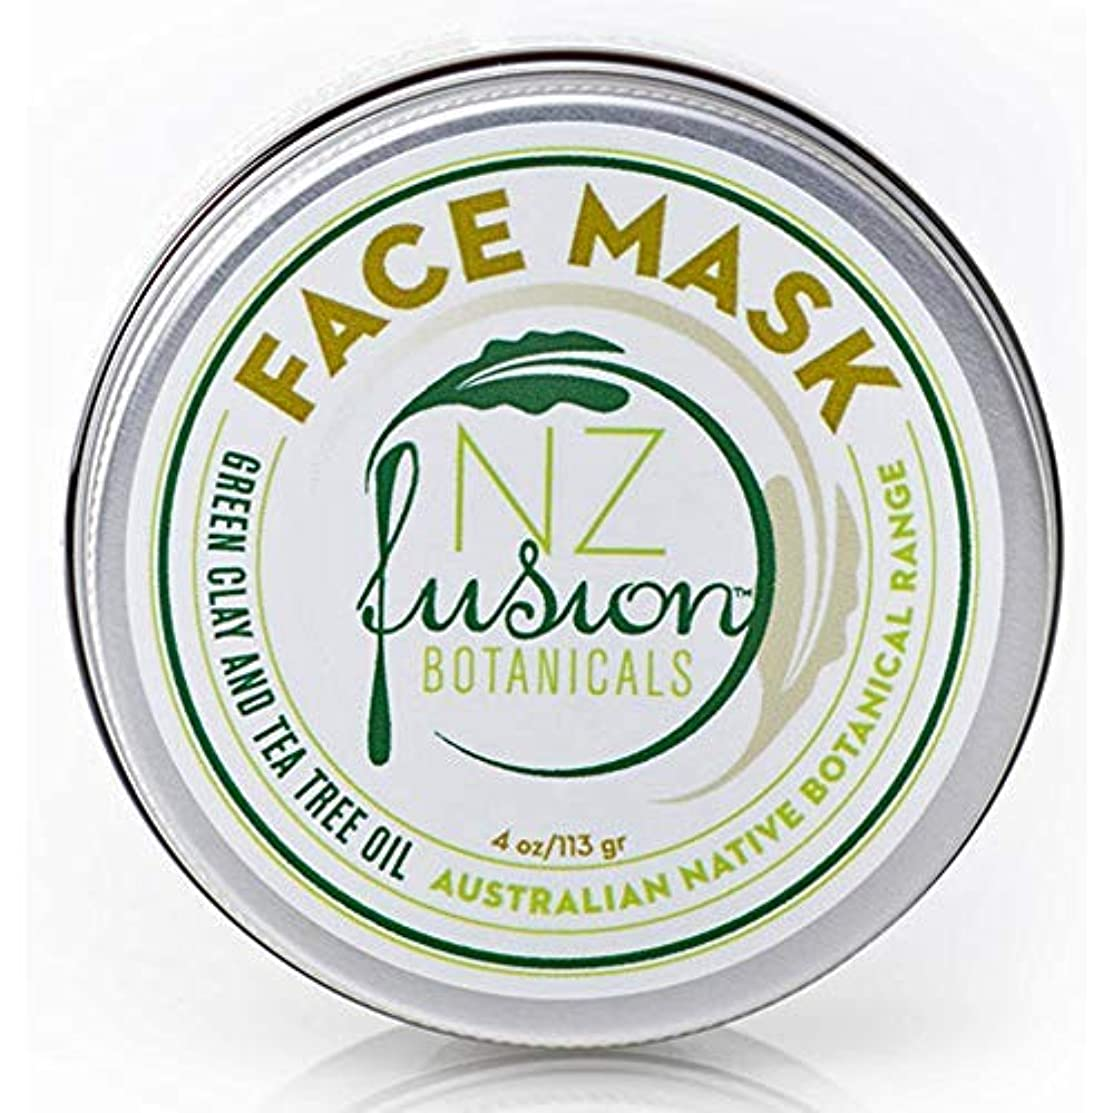 Australian Green Clay and Tea Tree Oil Face Mask 4 oz/113 gr.